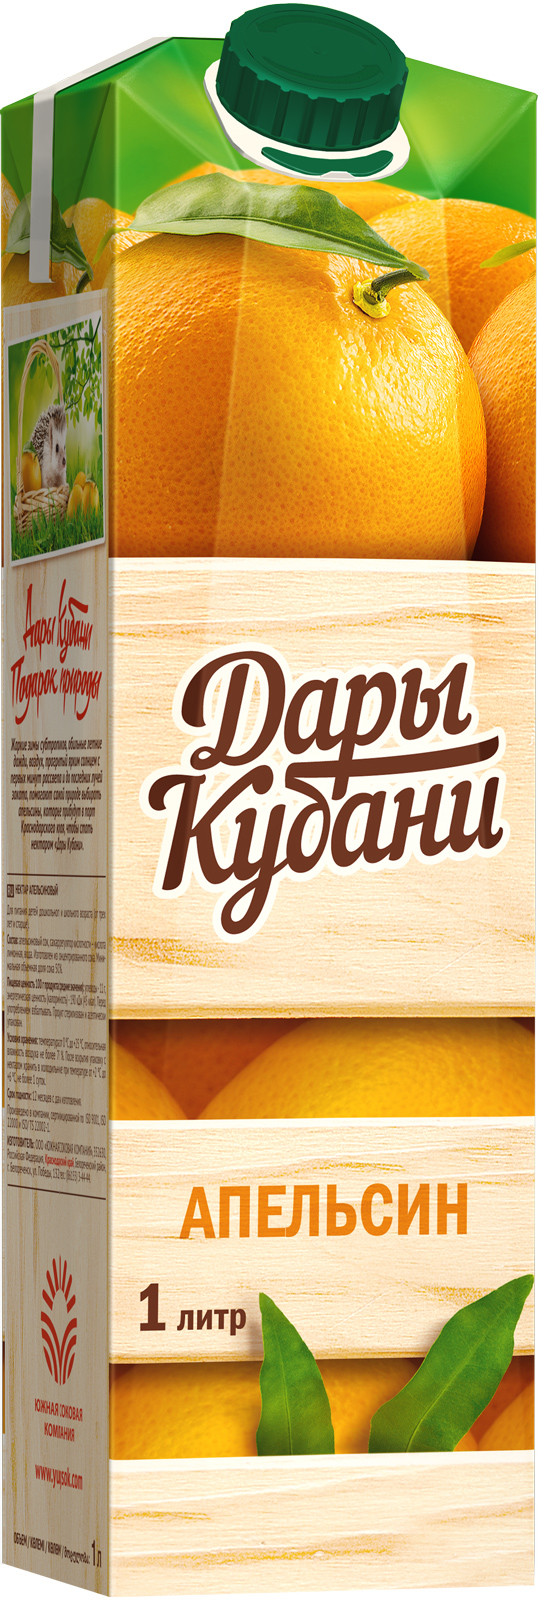 Нектар Дары Кубани апельсиновый 1 л pfanner нектар персик 1 л